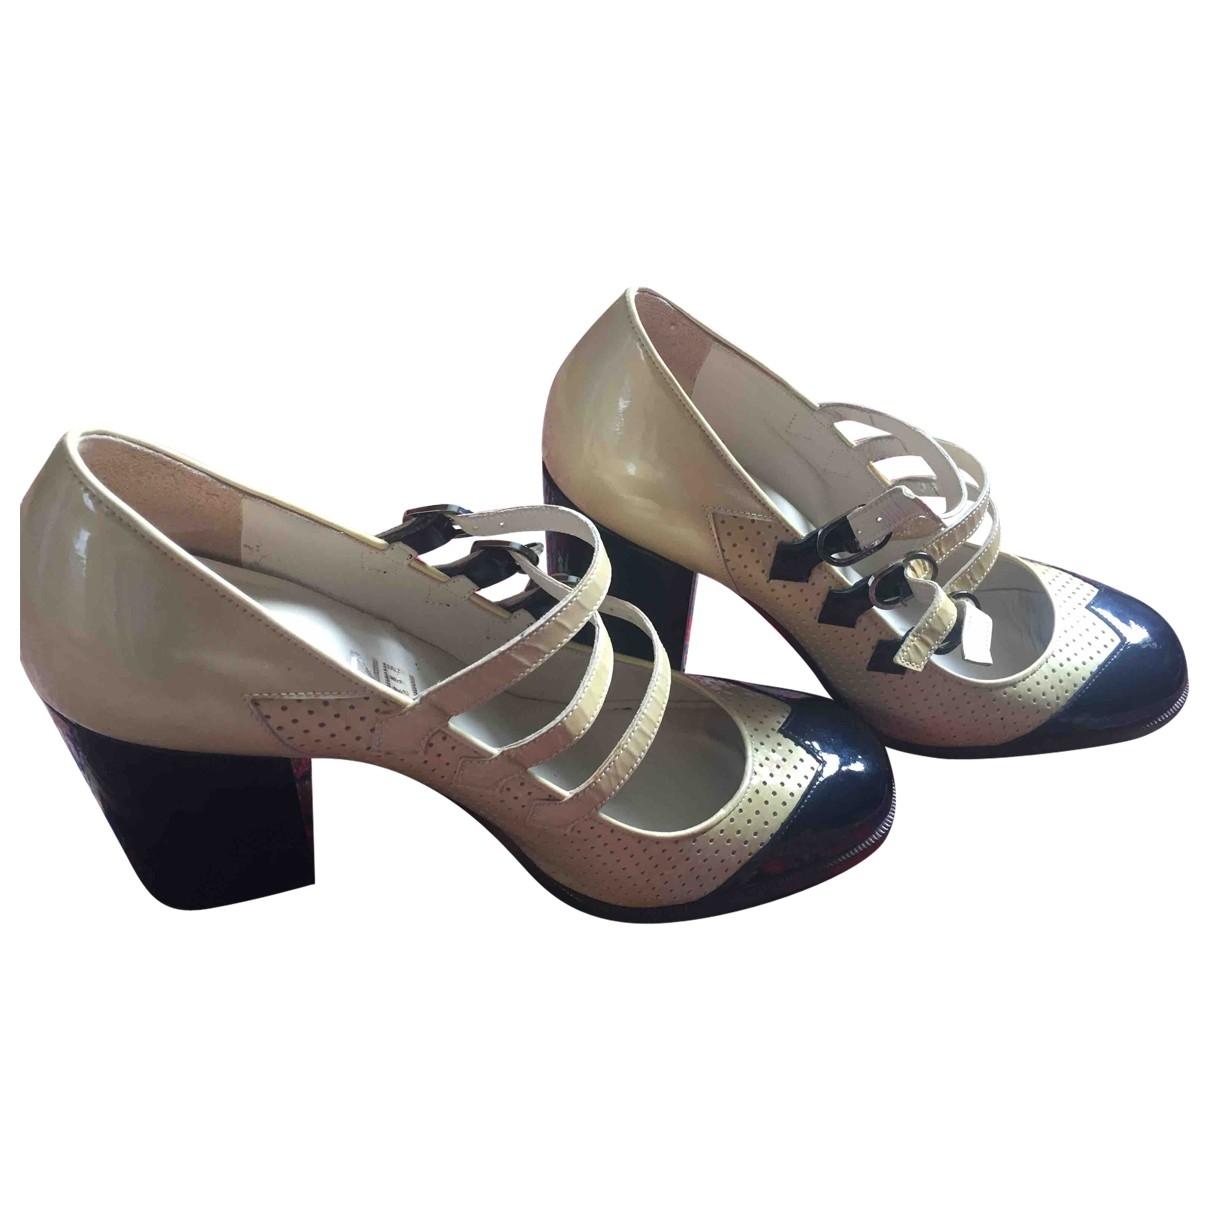 Chanel \N Ecru Patent leather Heels for Women 37.5 EU